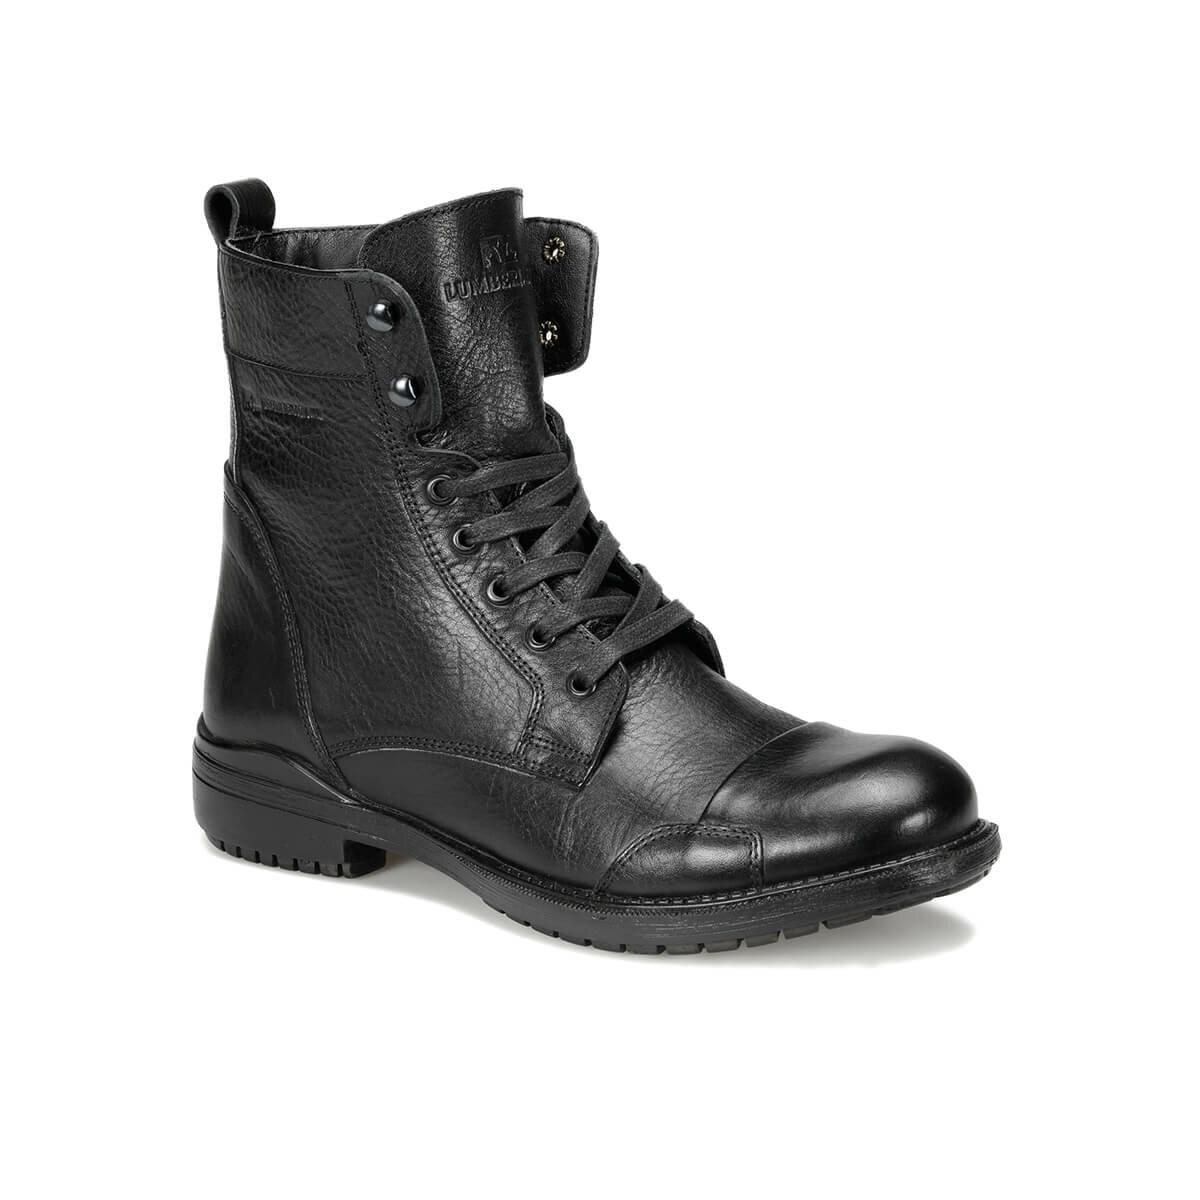 FLO MOTOREX 9PR Black Men Boots LUMBERJACK